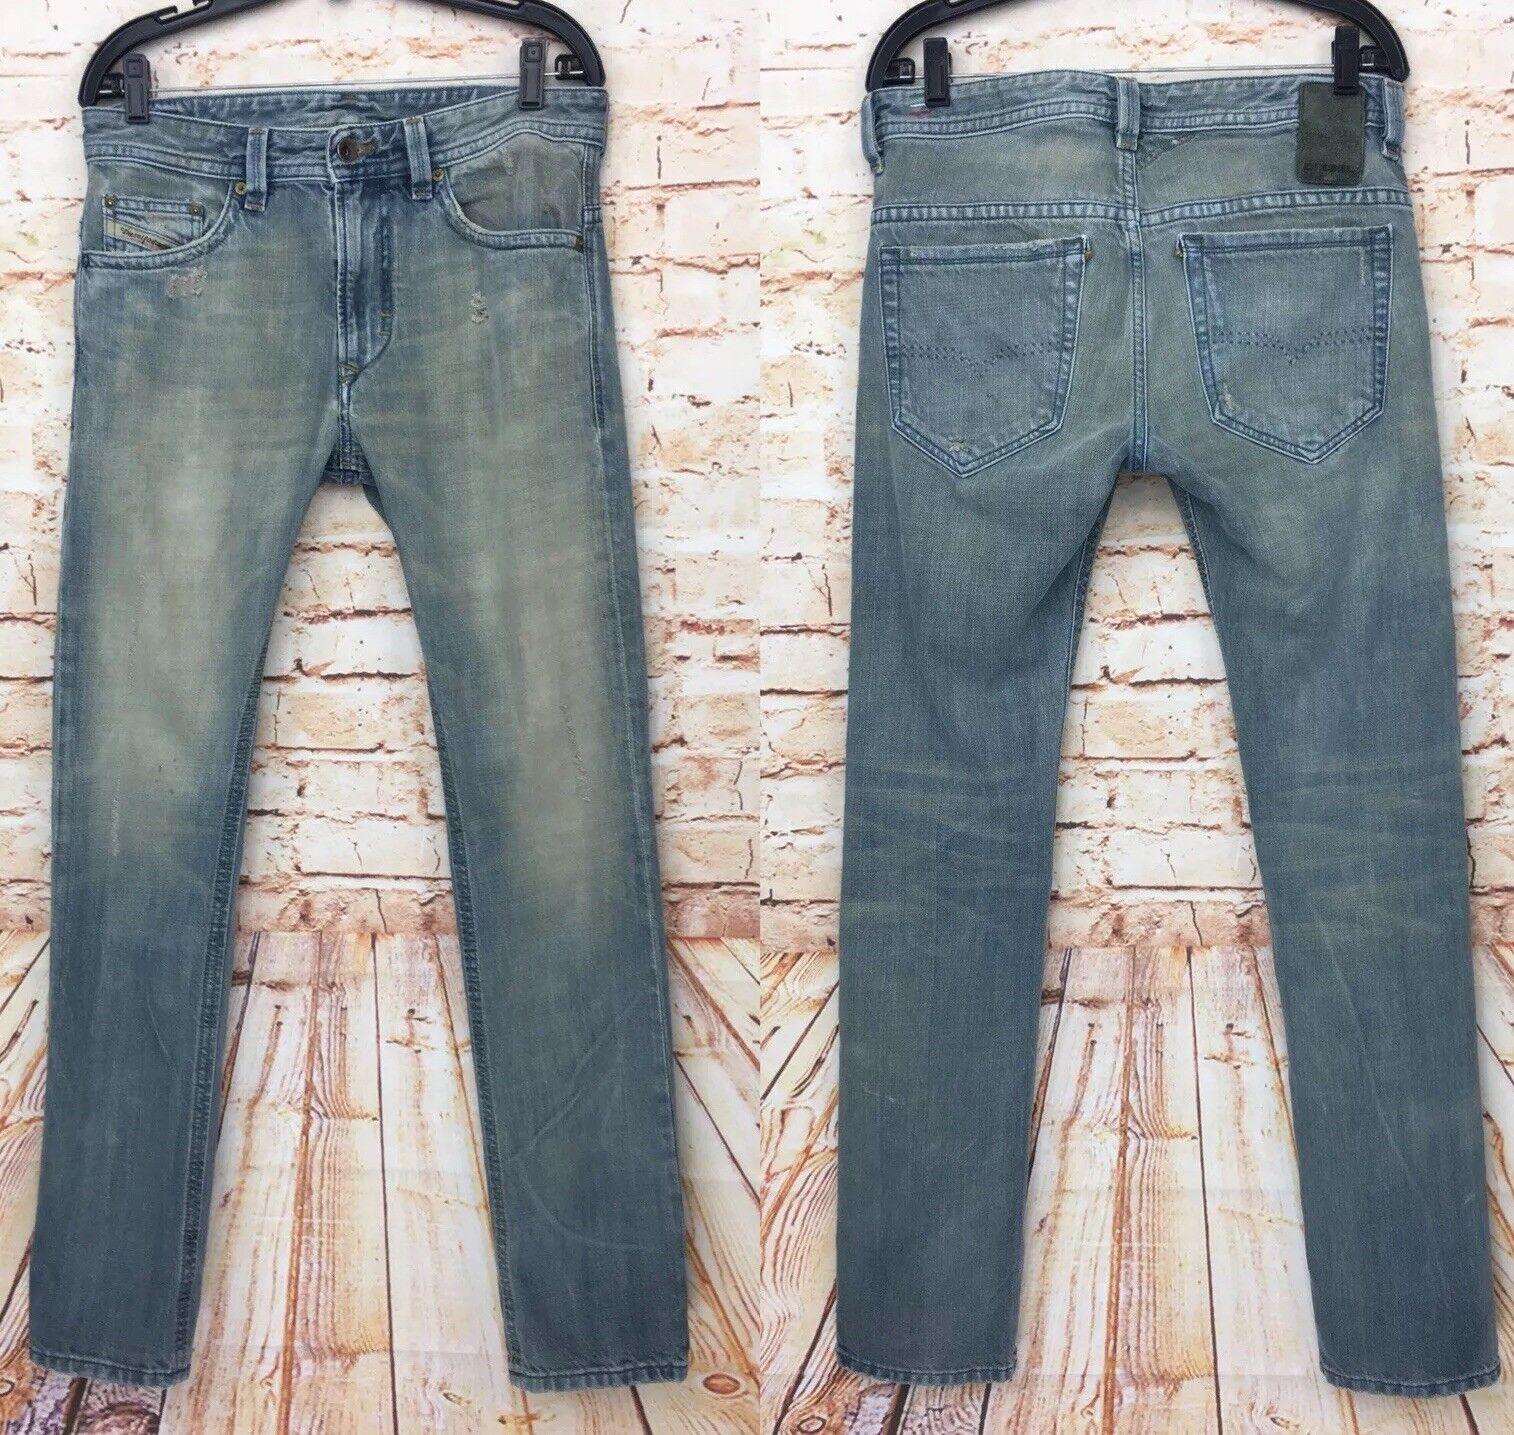 55590c39 Diesel bluee Eyecons 2012 1 Edition Jeans Denim Men's Sz Made in 30 ...